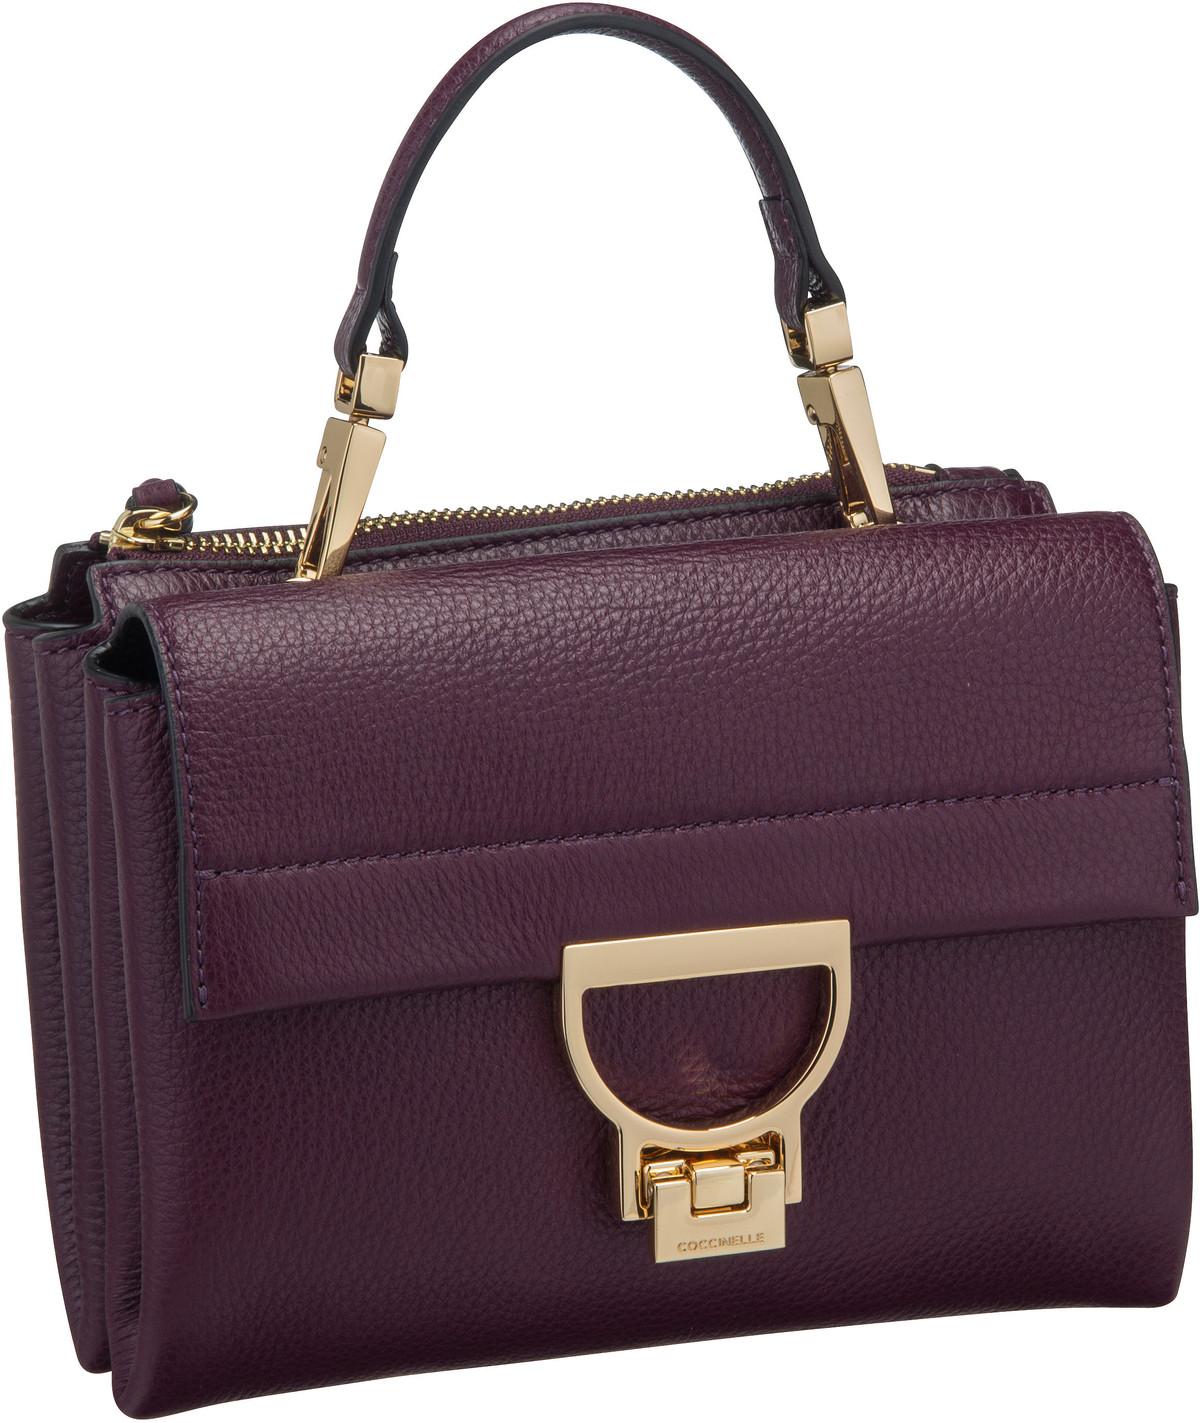 Handtasche Arlettis 55B7 Plum